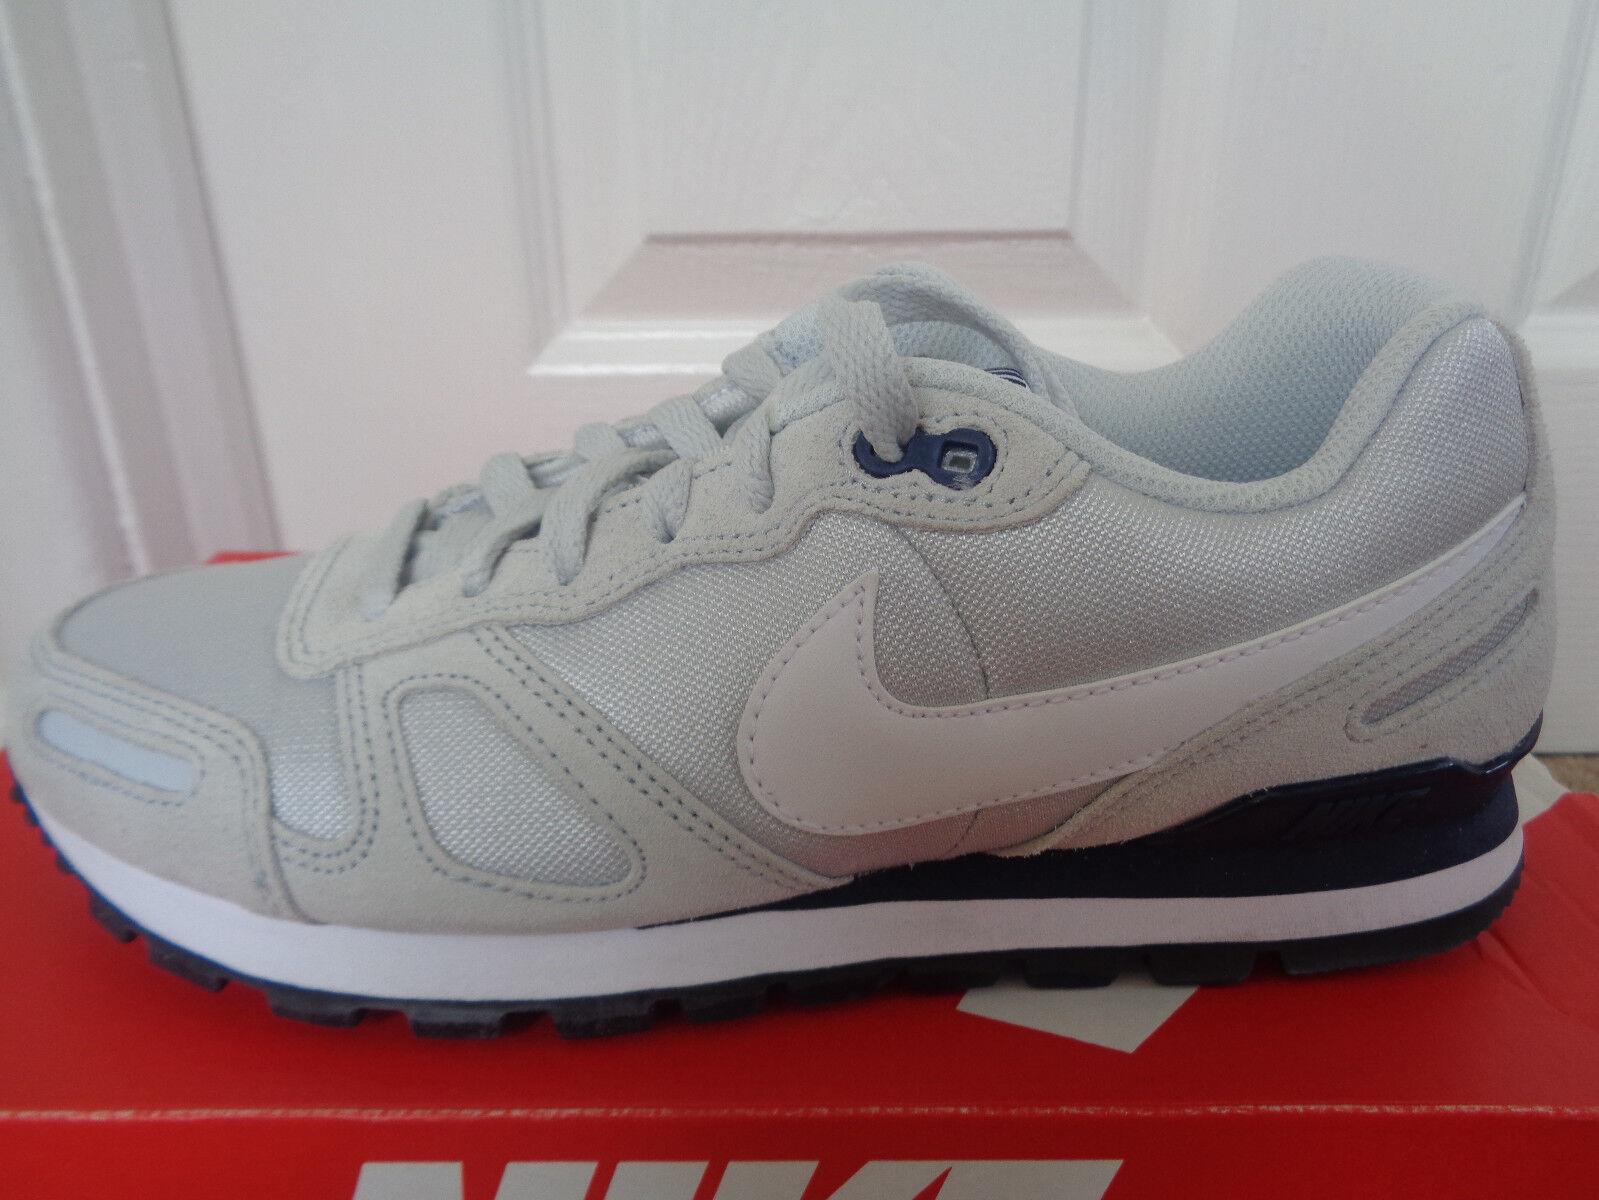 Nike Air Waffle Trainer mens trainers shoes 429628 095 uk 6 eu 40 us 7 NEW+BOX